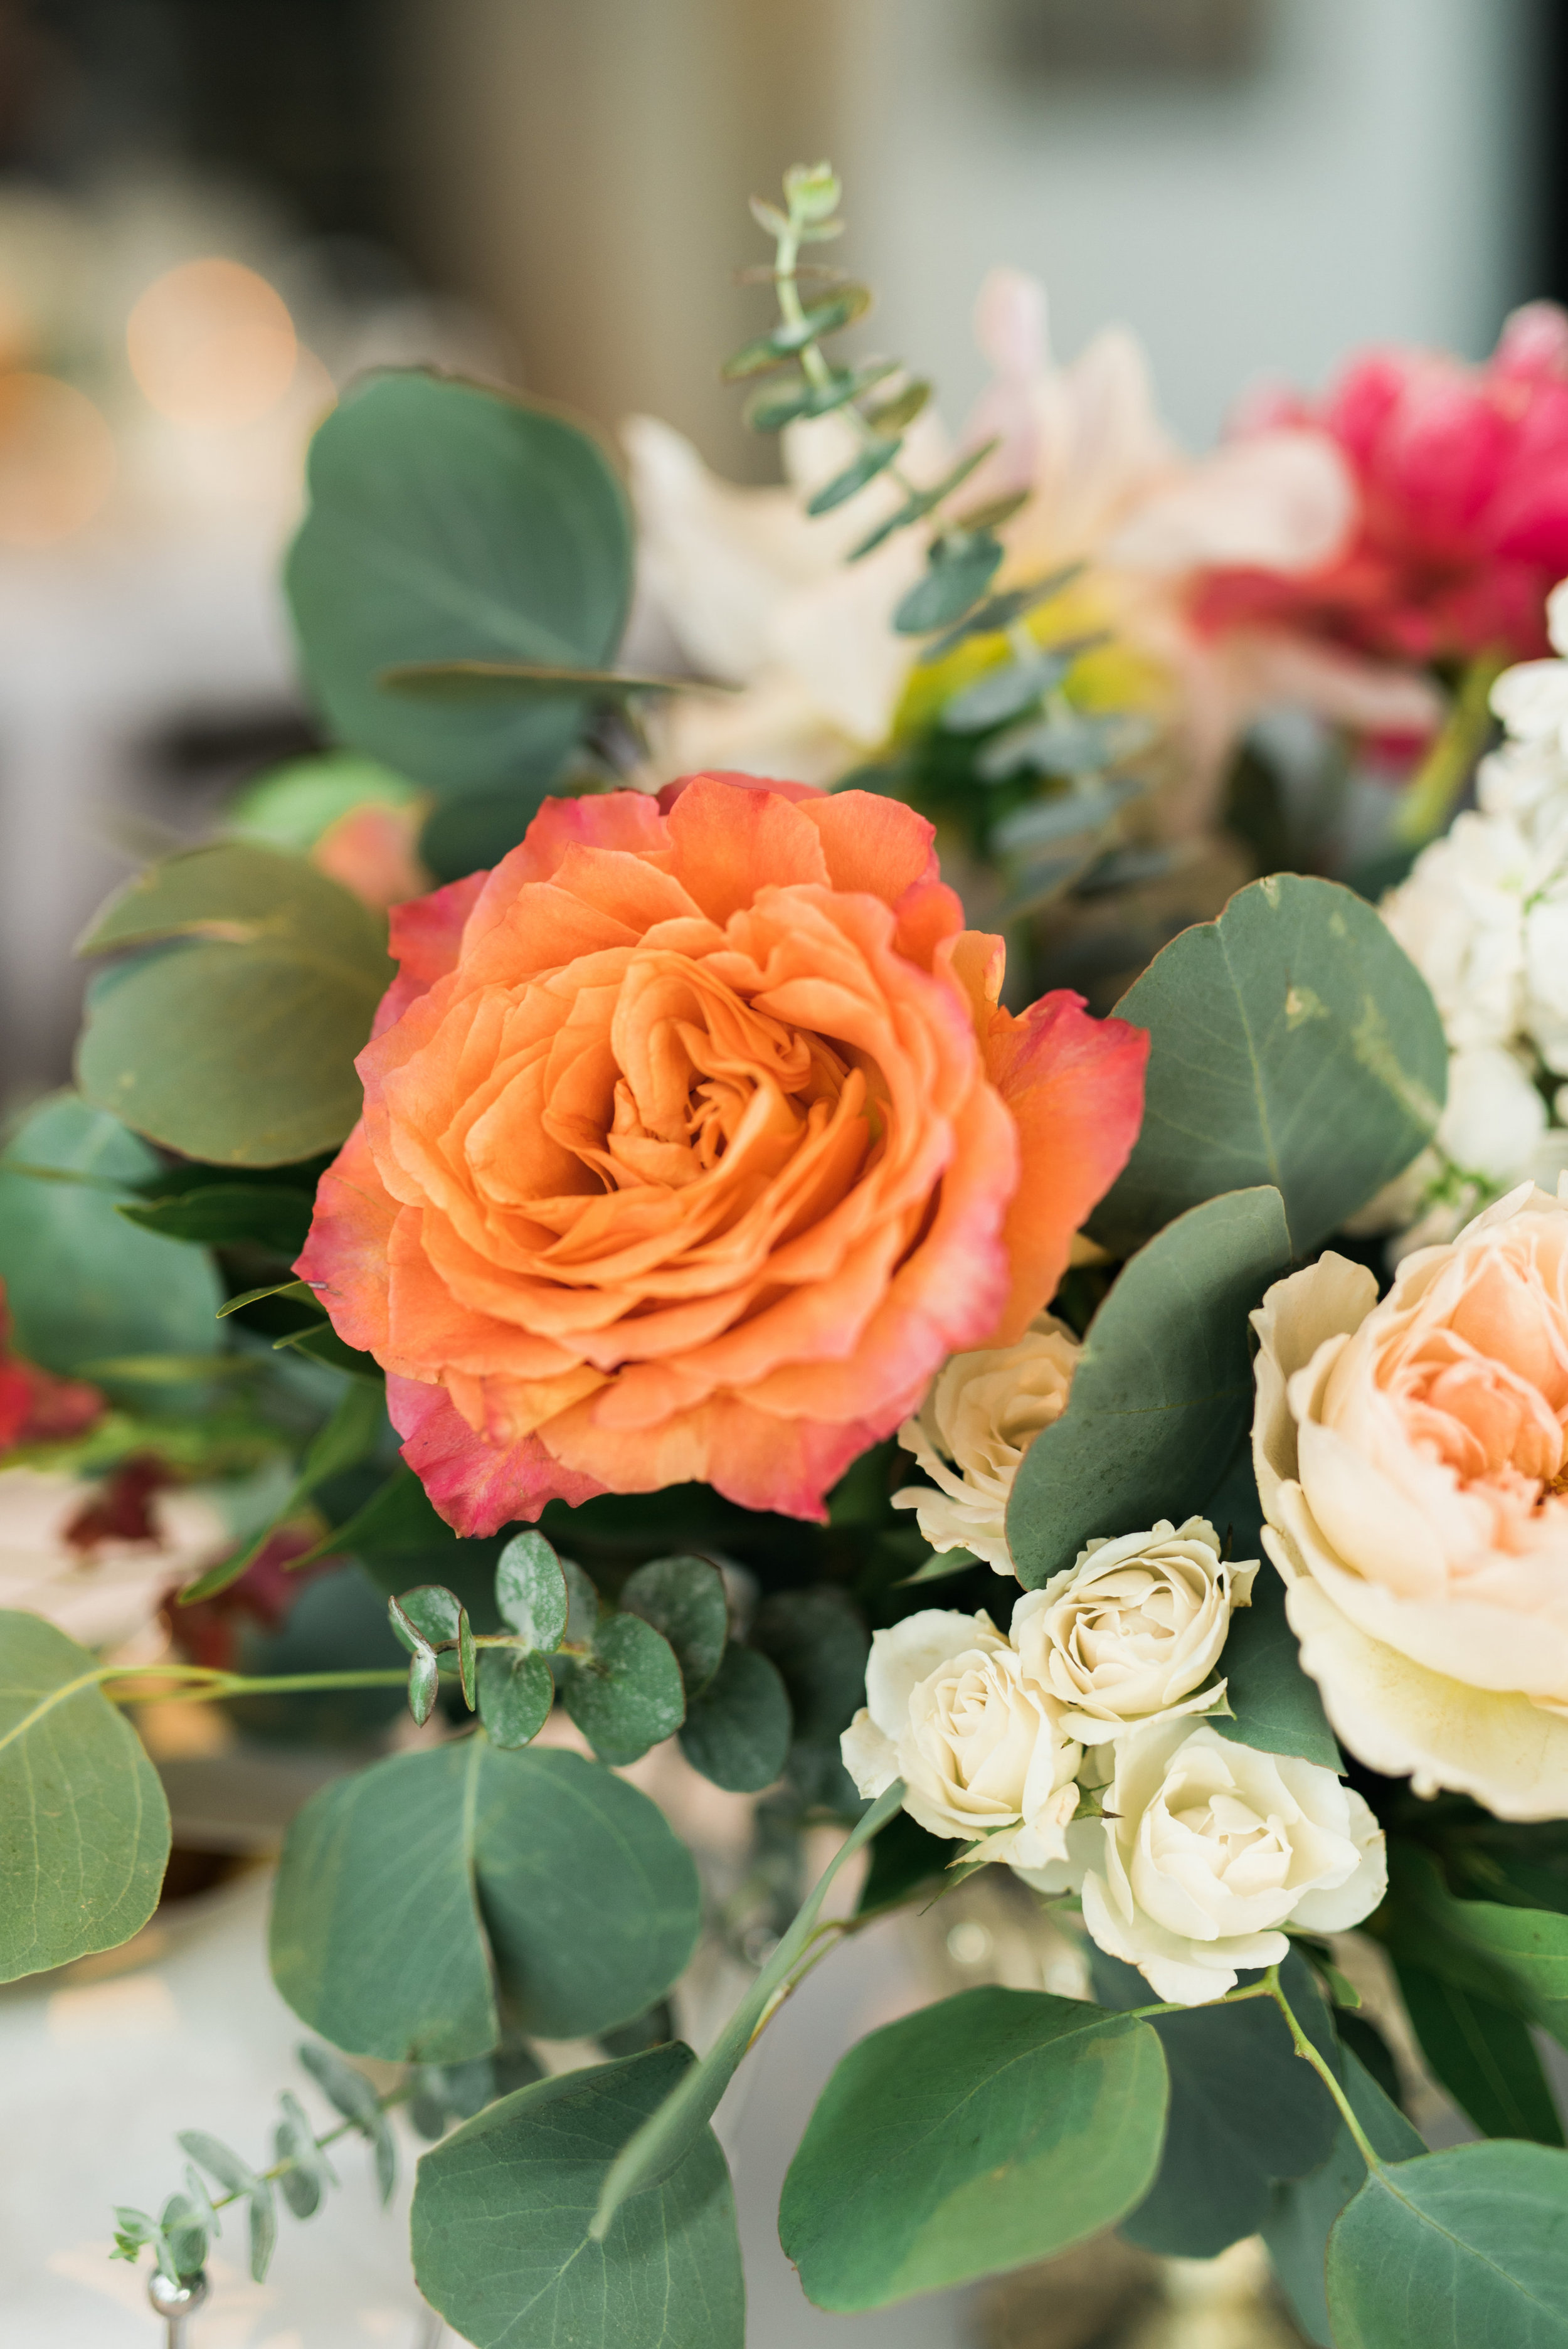 wedding flowers, orange wedding flowers, ivory wedding flowers, blush wedding flowers